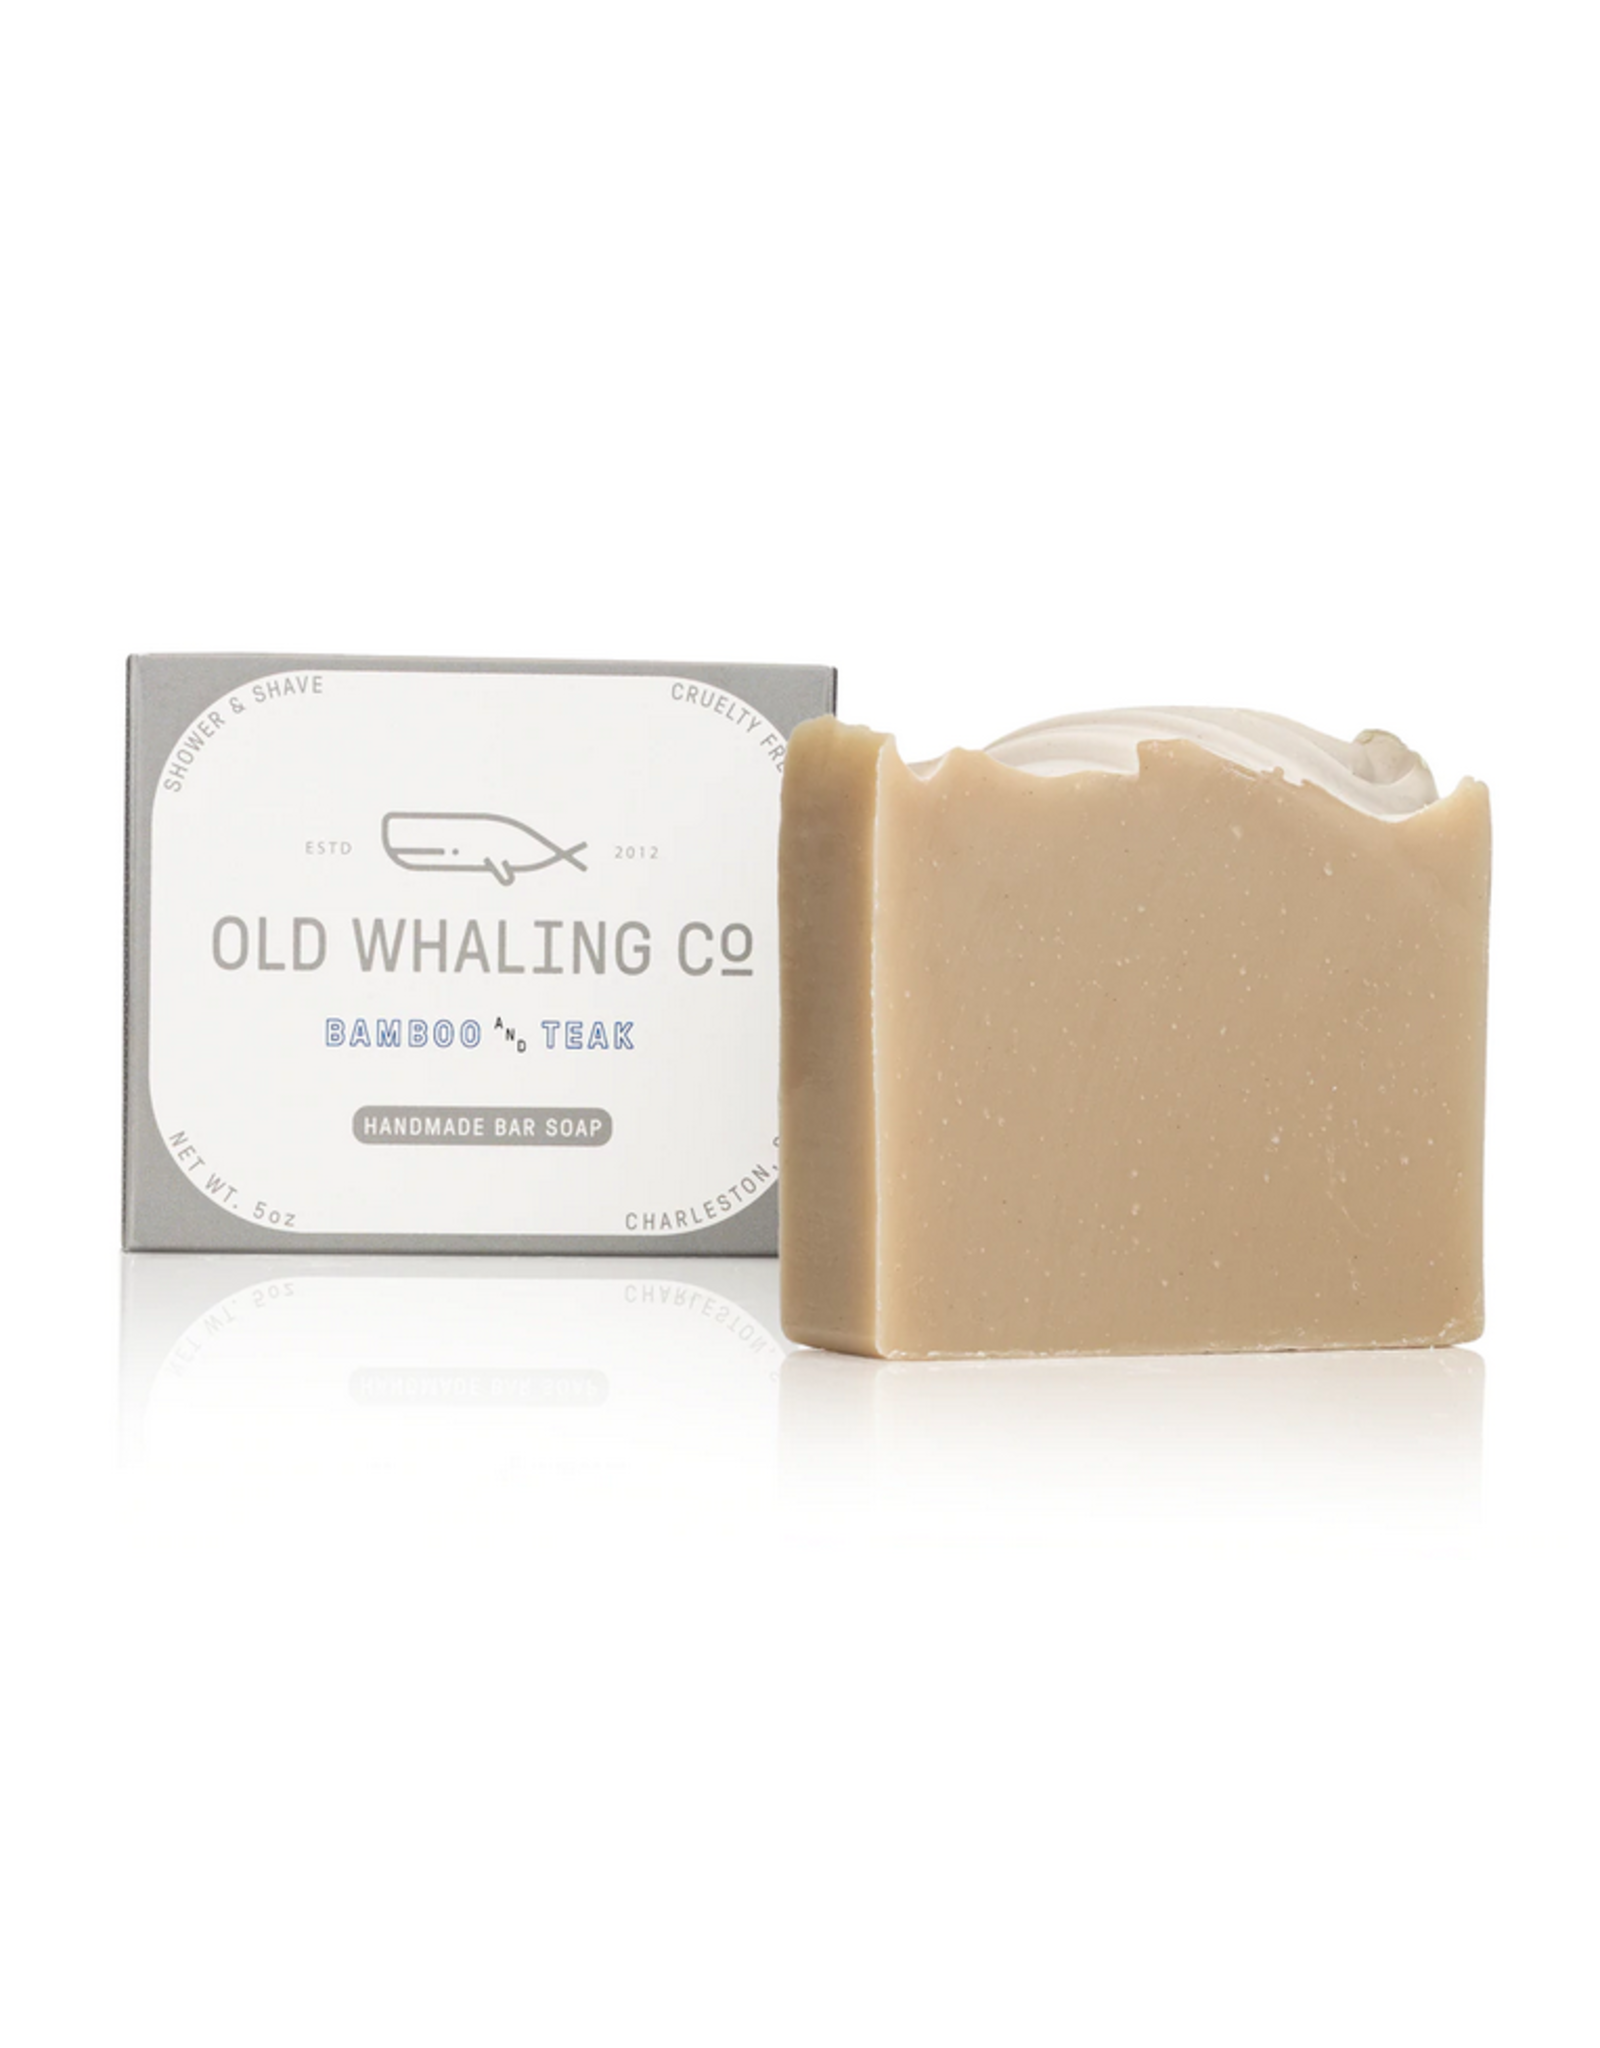 Old Whaling Co. Bamboo & Teak 5.5oz Soap Bar